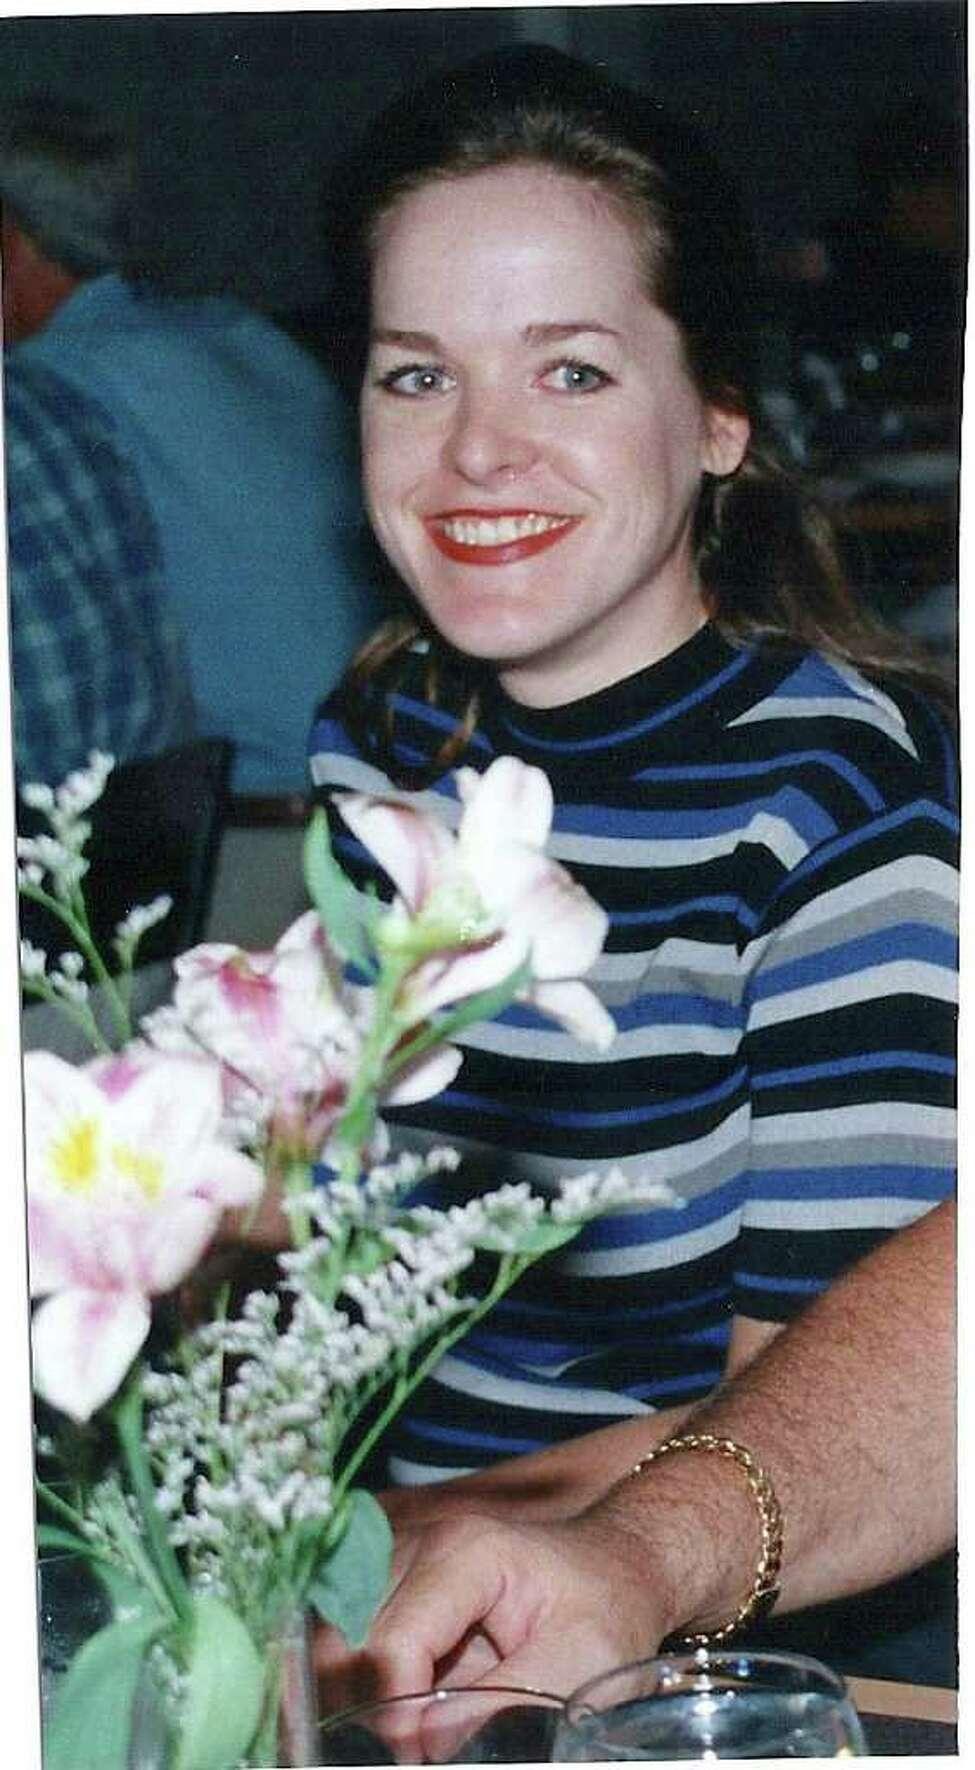 Kristin Keeffe. (TheFallofNXIVM.com)